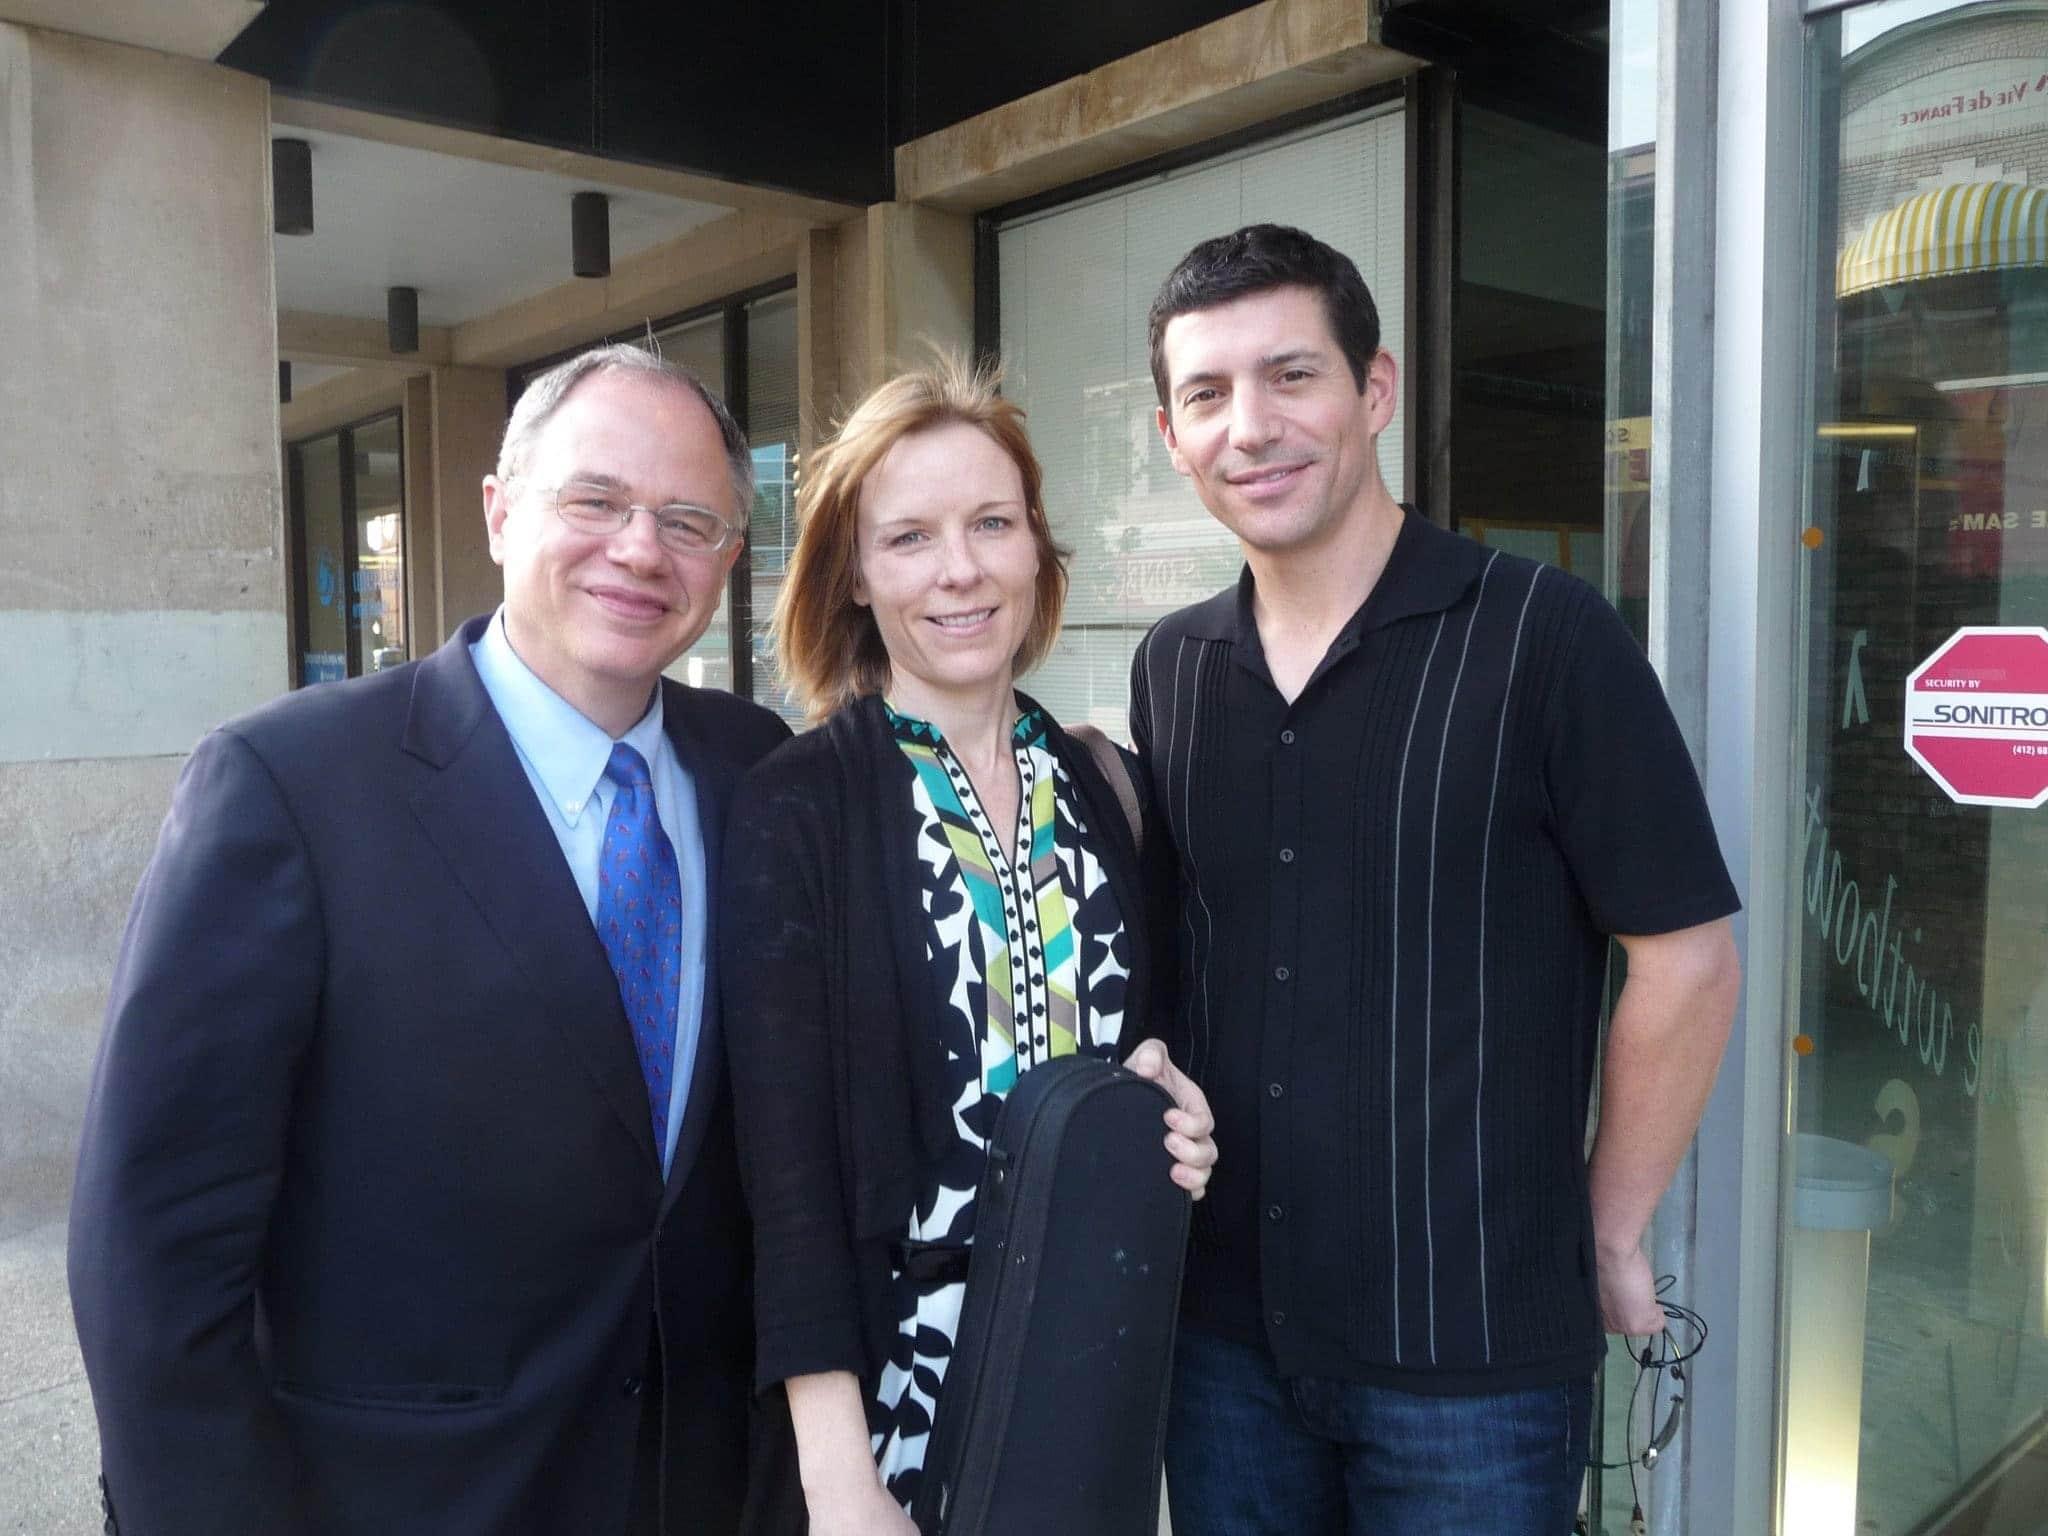 Jim Cunningham, Jennifer Orchard, Michael Rusinek